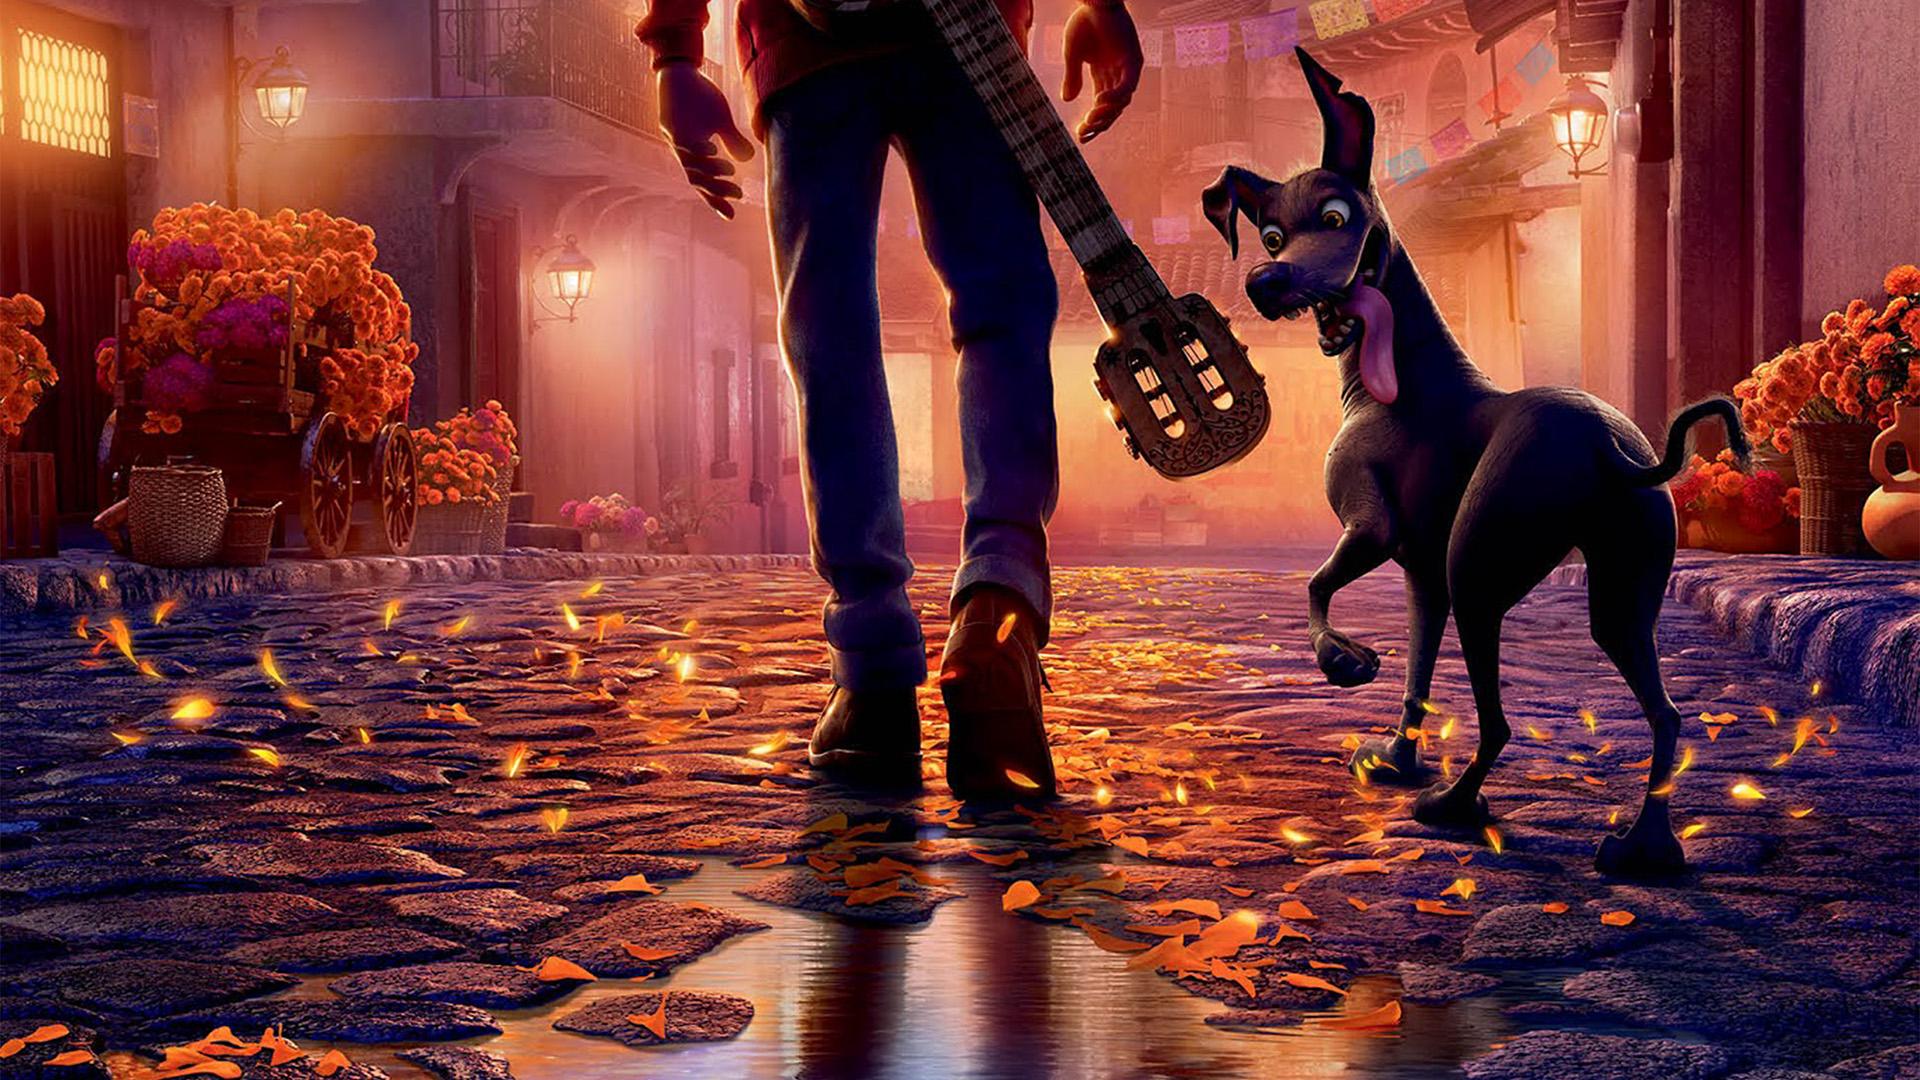 4k Fall Mountain Wallpaper Bd50 Disney Pixar Coco Filme Anime Art Illustration Wallpaper